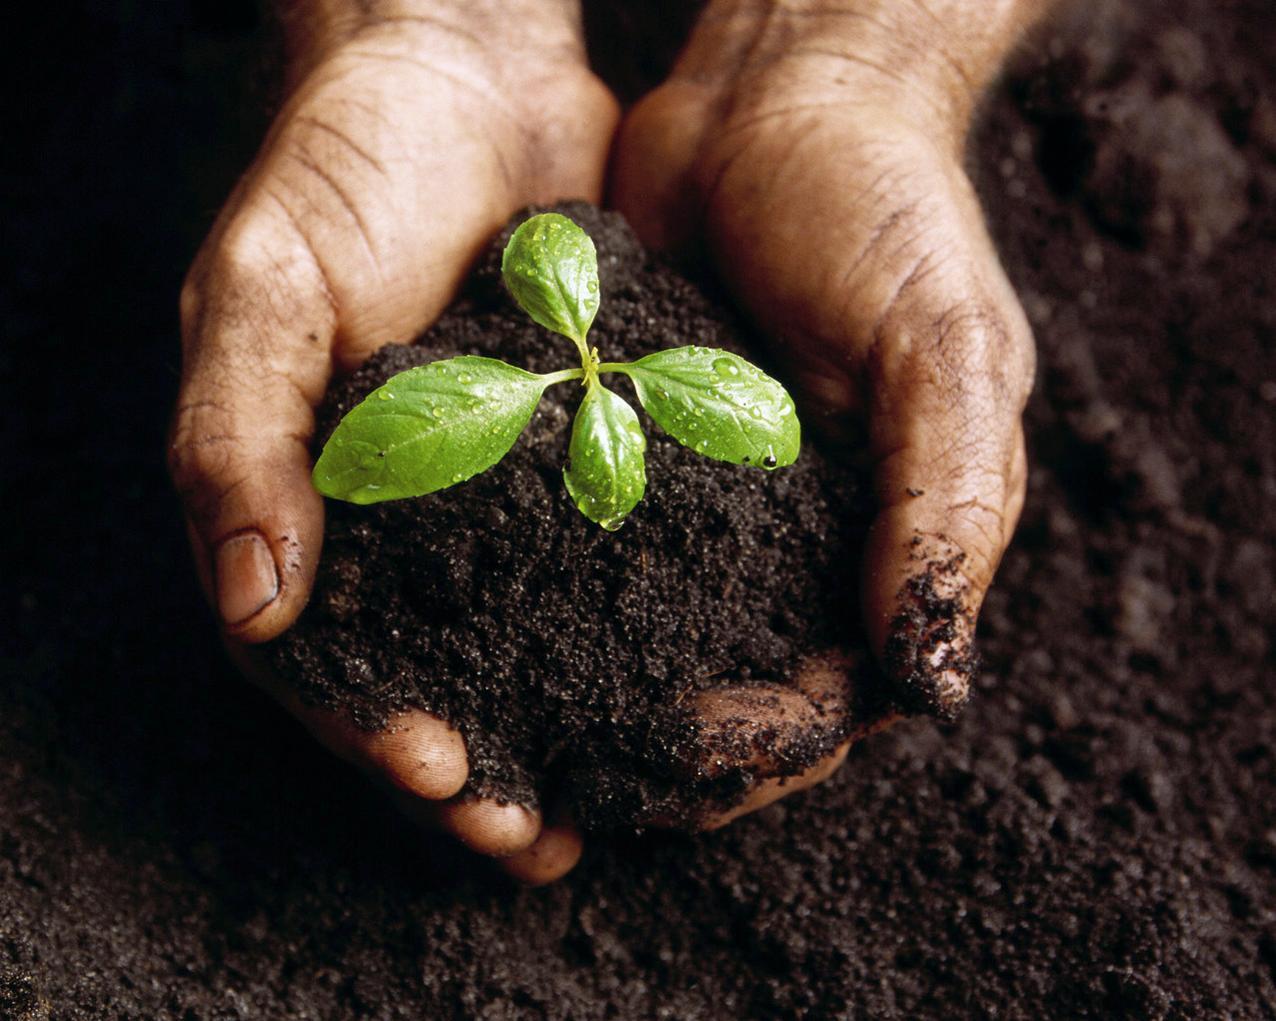 plantar_igrejas-793471